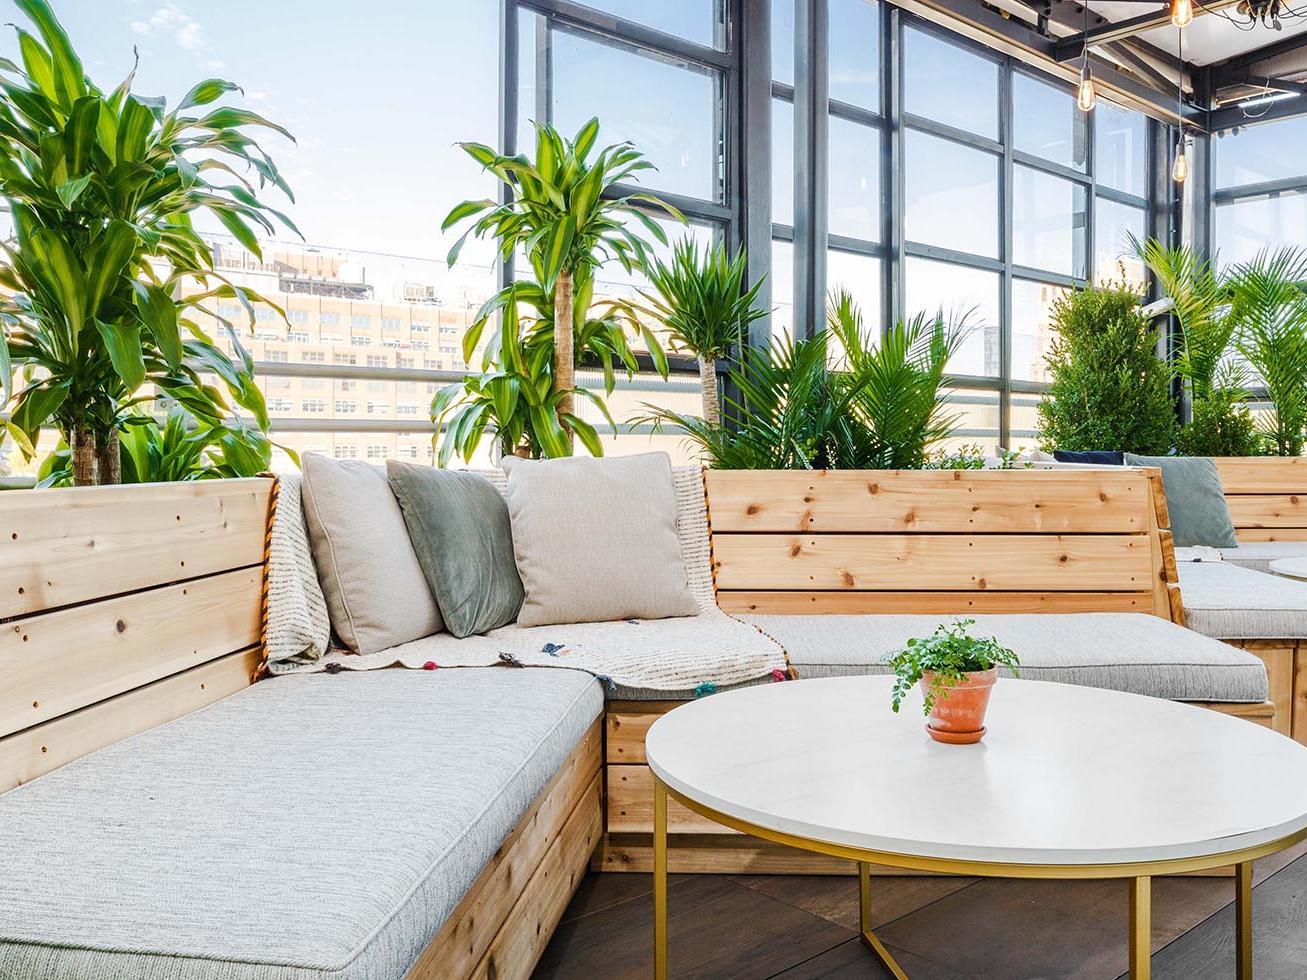 B On top terrace